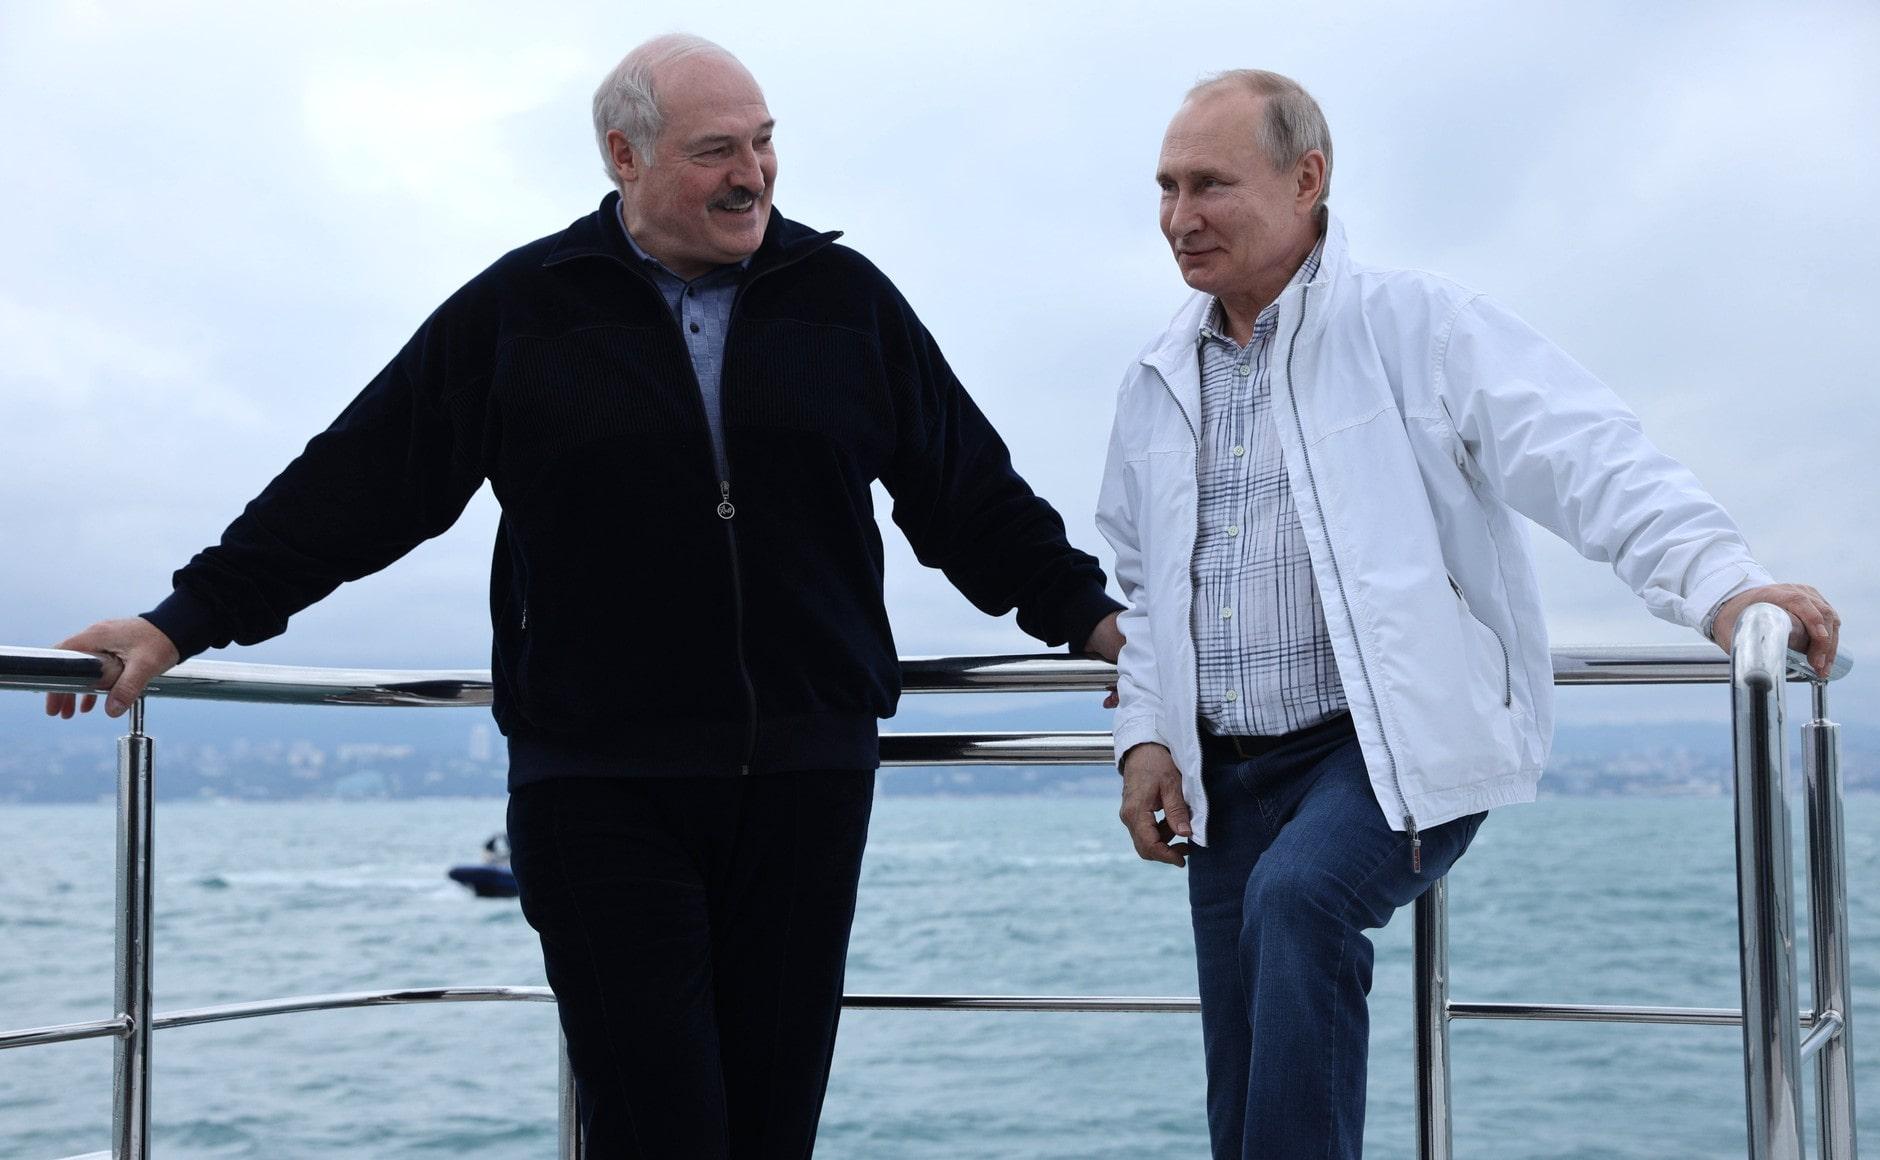 СМИ: Путин покатал Лукашенко и его сына Колю в Сочи на 54-метровой яхте за €30 млн. ВИДЕО 1